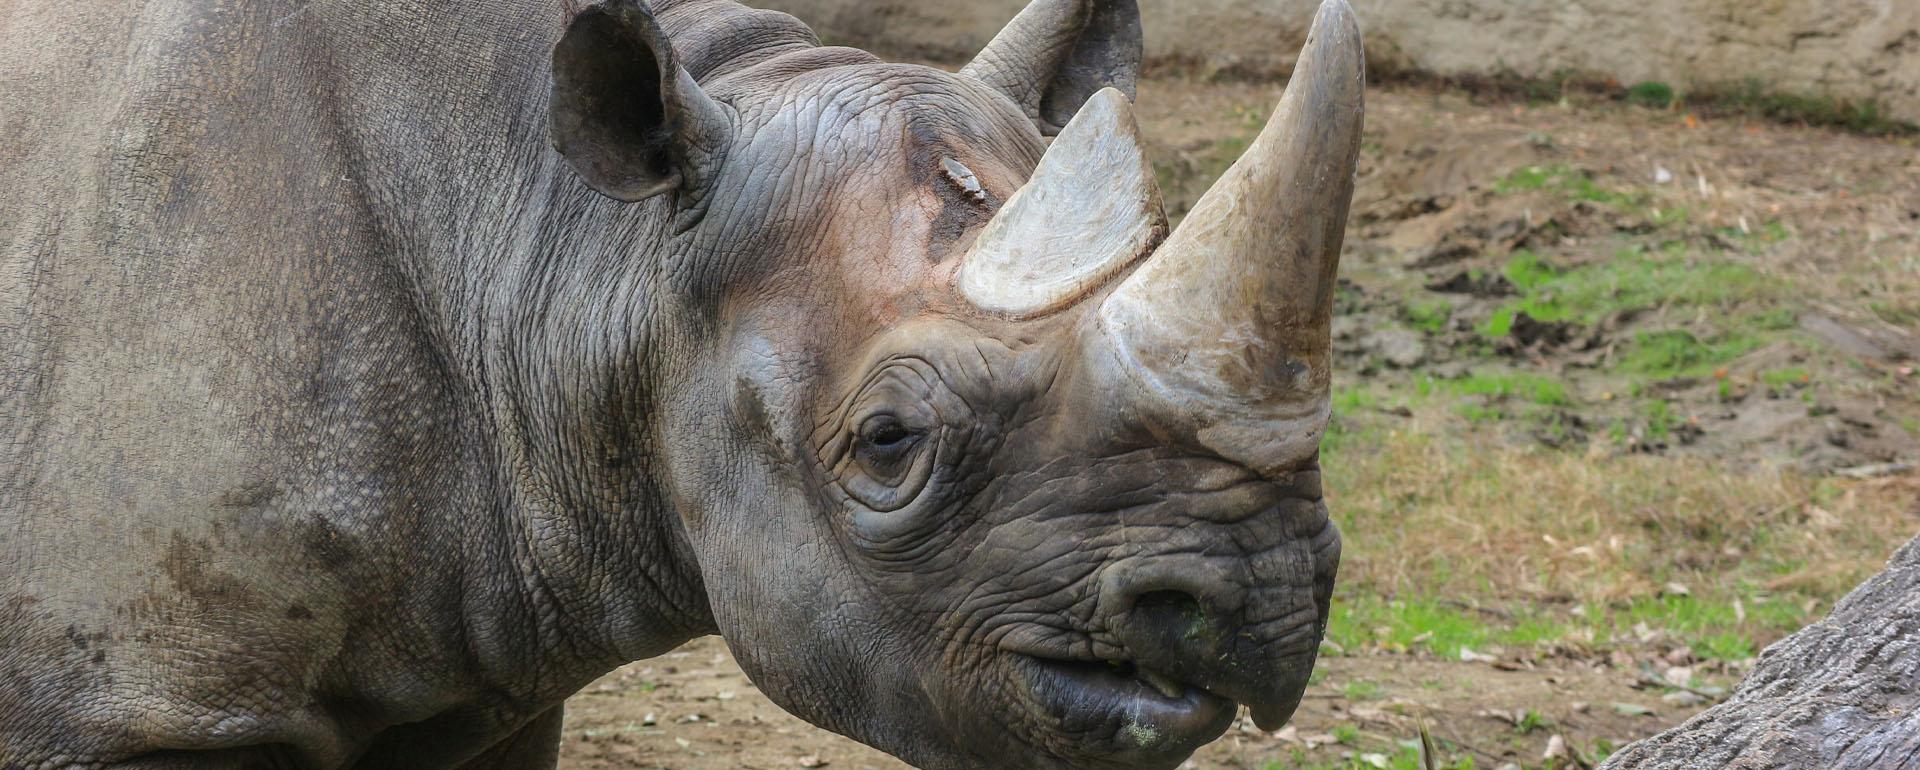 Rhino Watch - African Adventure Specialists